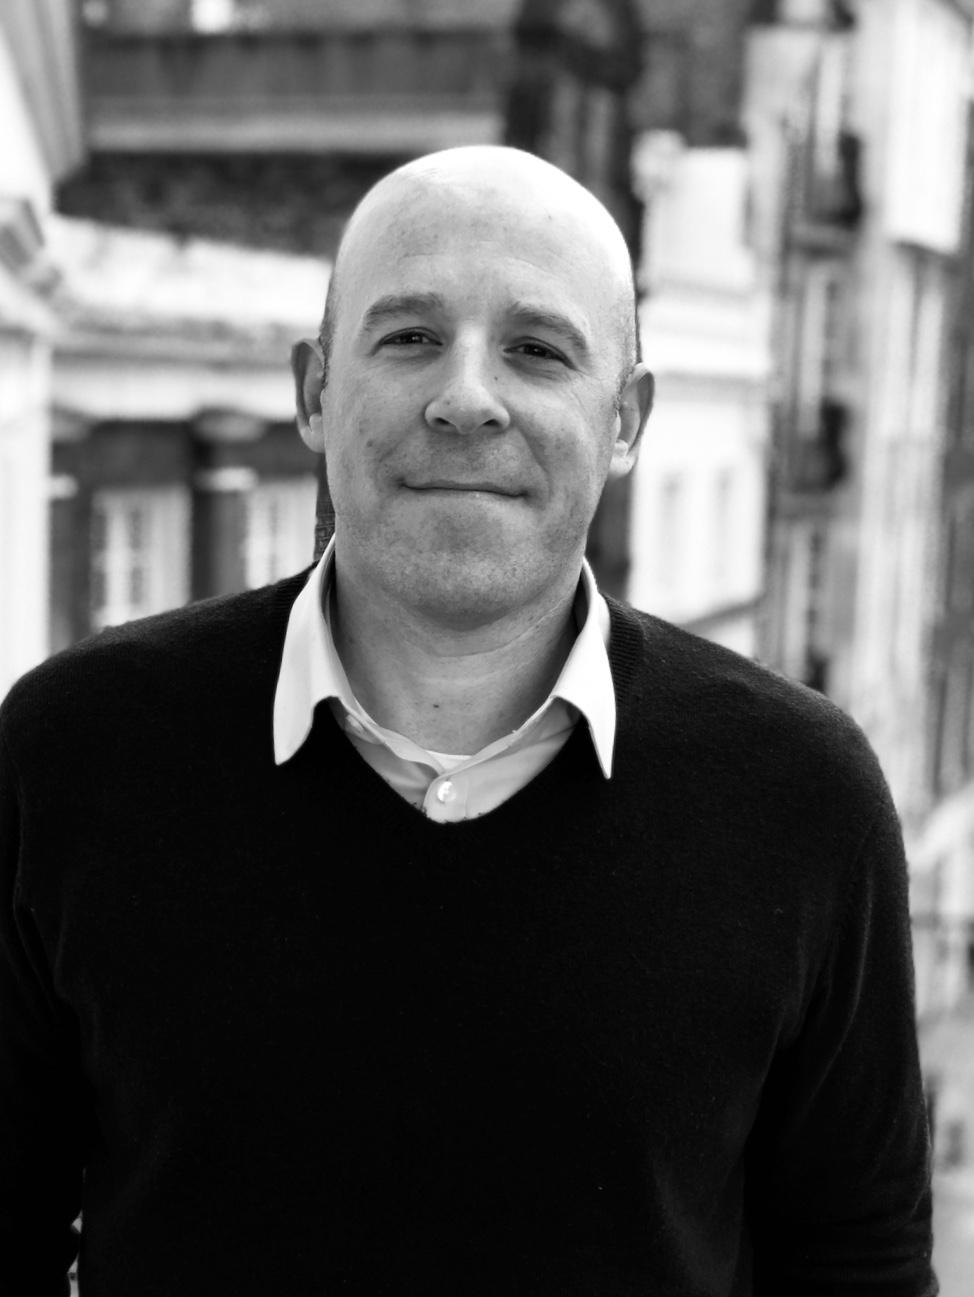 Simon Shelley - Managing Director